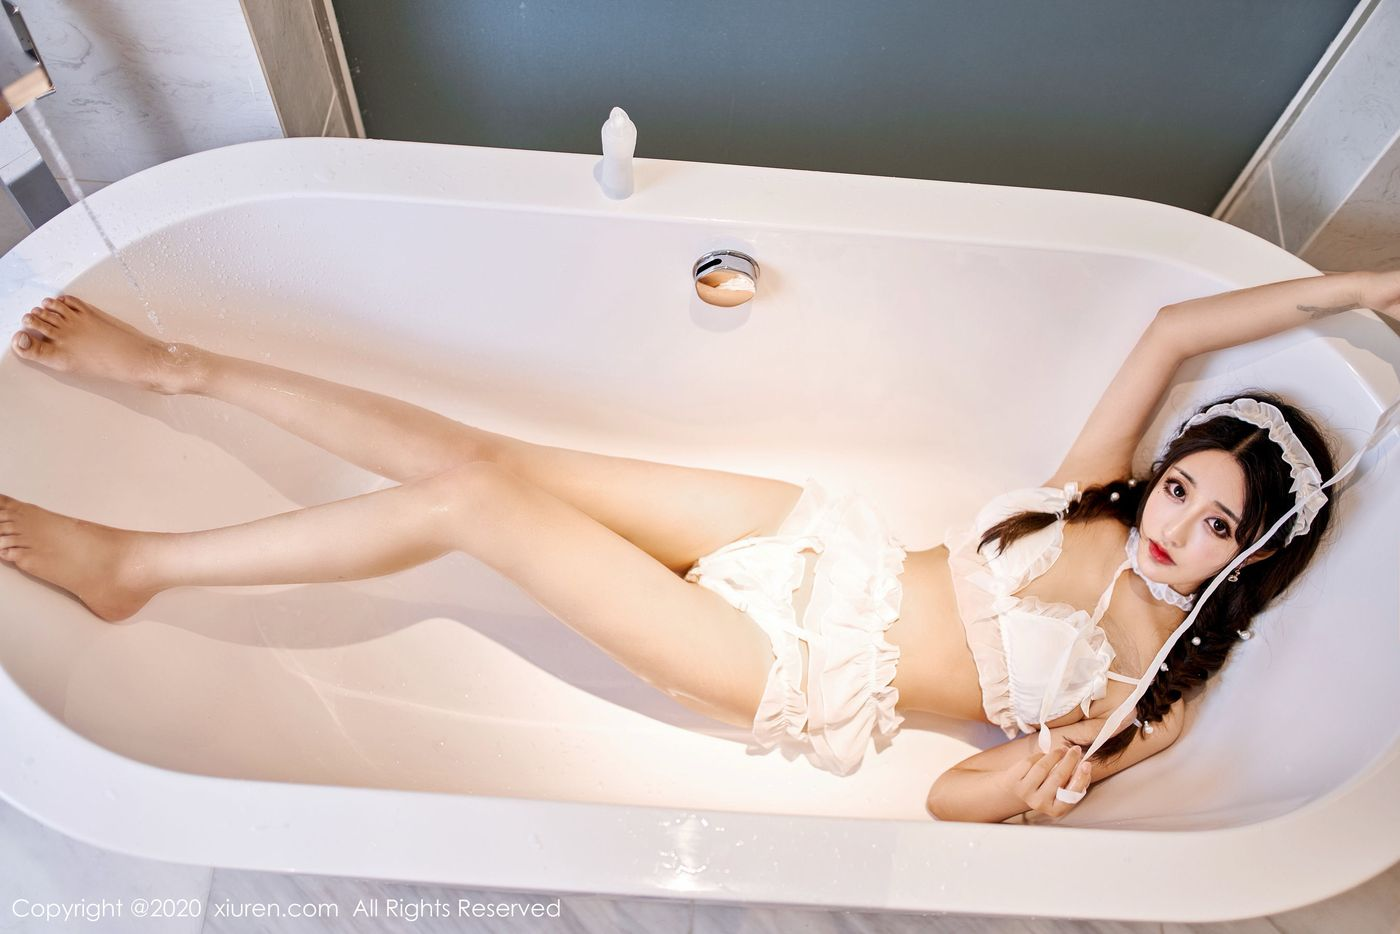 Vol.734 浴室美女湿身诱惑翘臀内衣诱惑美胸美女模特秀人网-林子欣完整私房照合集